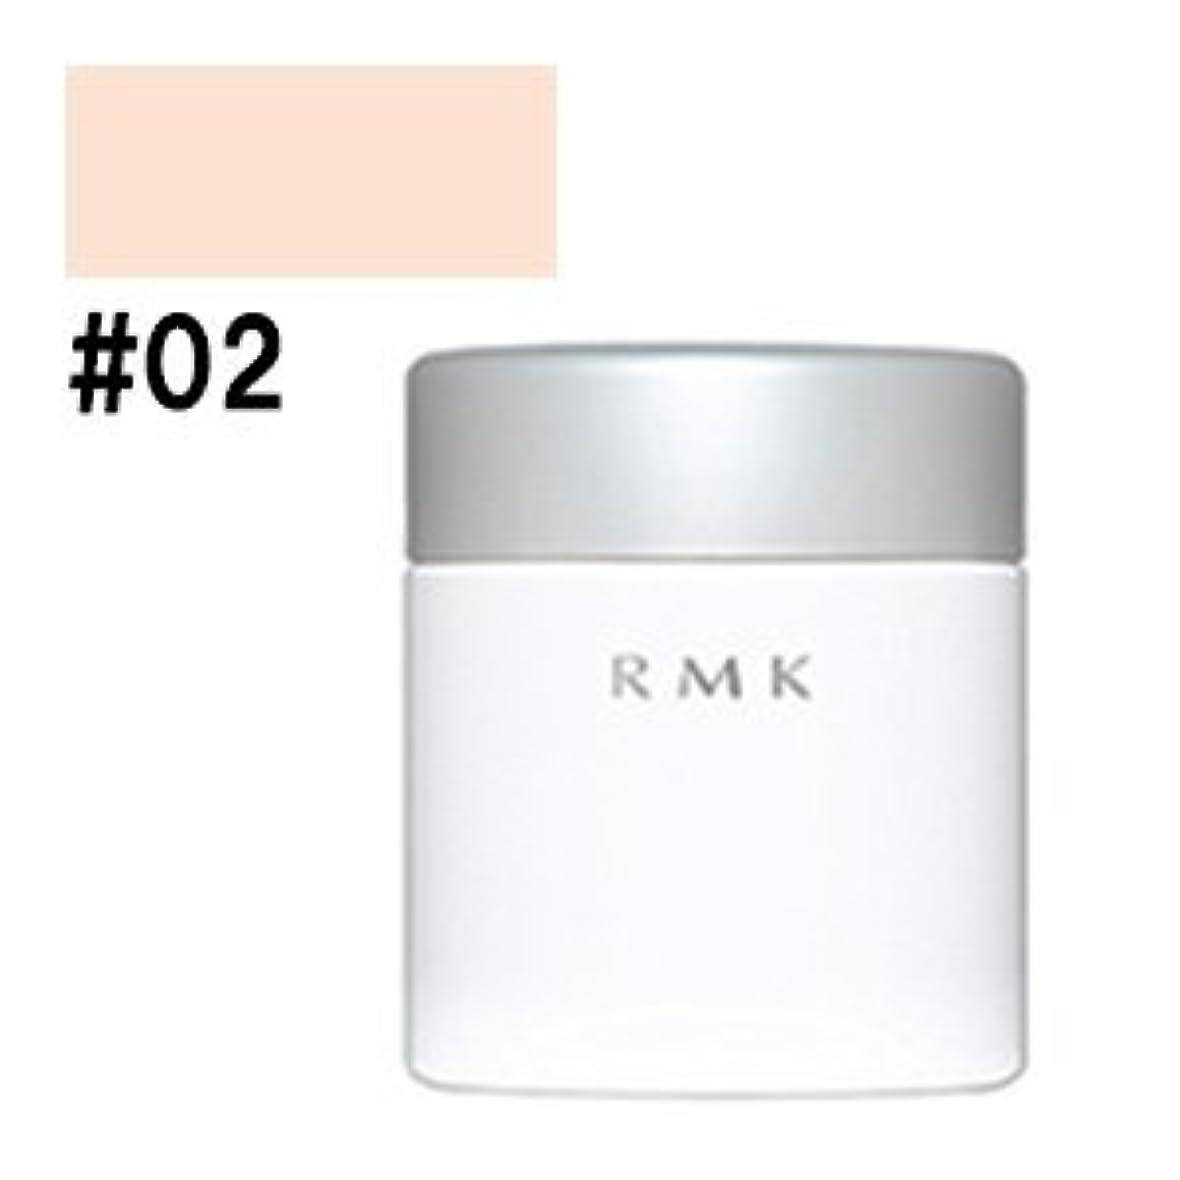 【RMK フェイスパウダー】トランスルーセント フェイスパウダー レフィル #02 【並行輸入品】